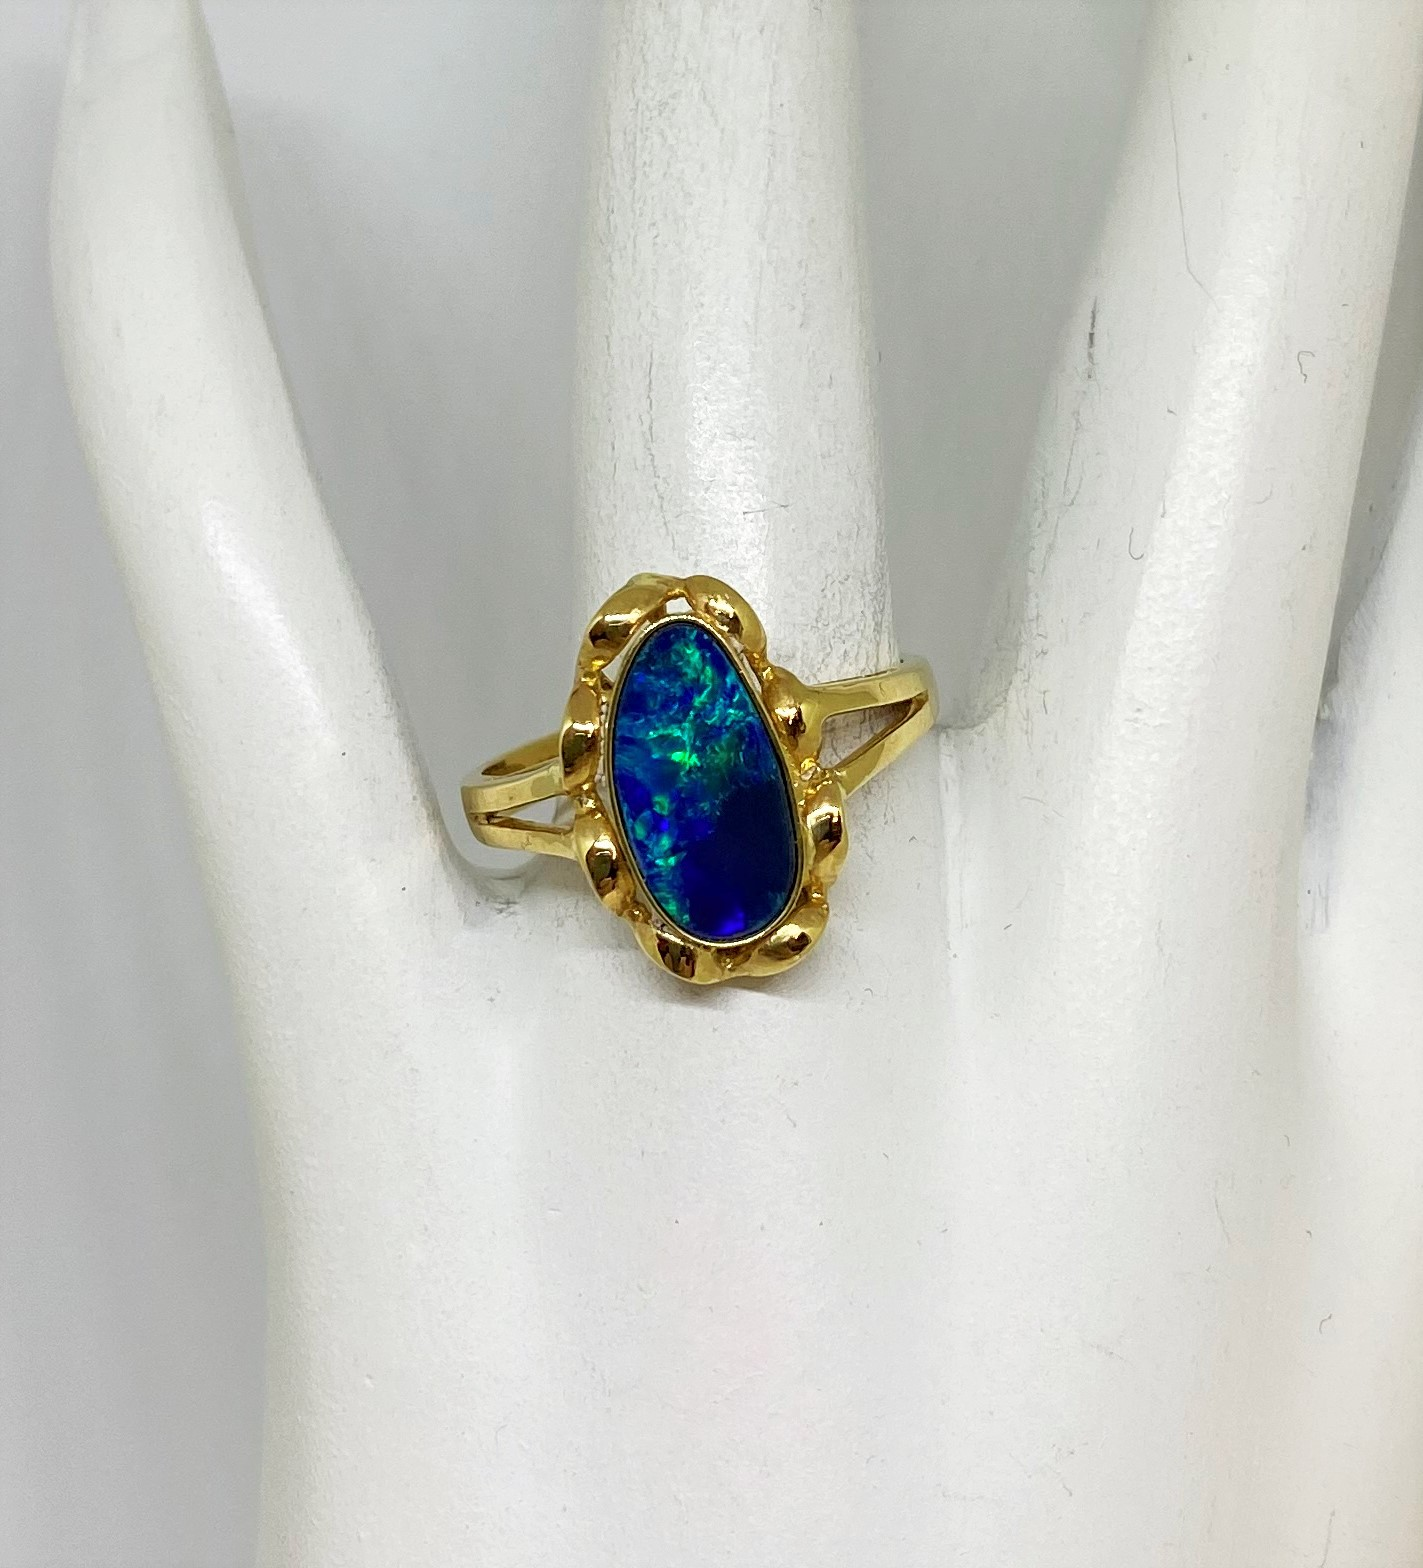 1 Carat Opal Yellow Gold Ring